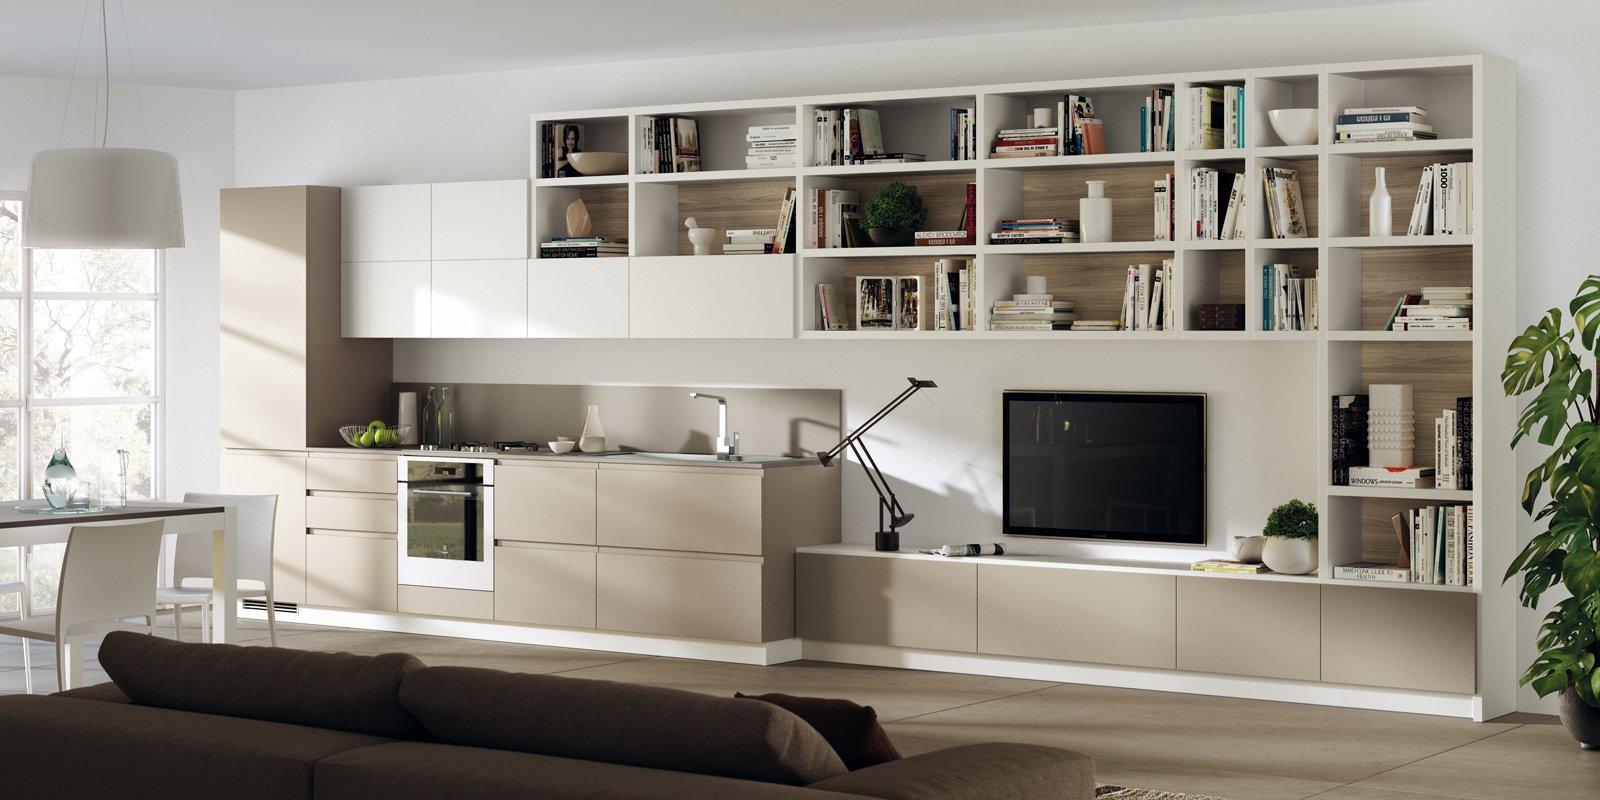 14 soluzioni coordinate di cucina soggiorno cose di casa - Camere da pranzo moderne ...